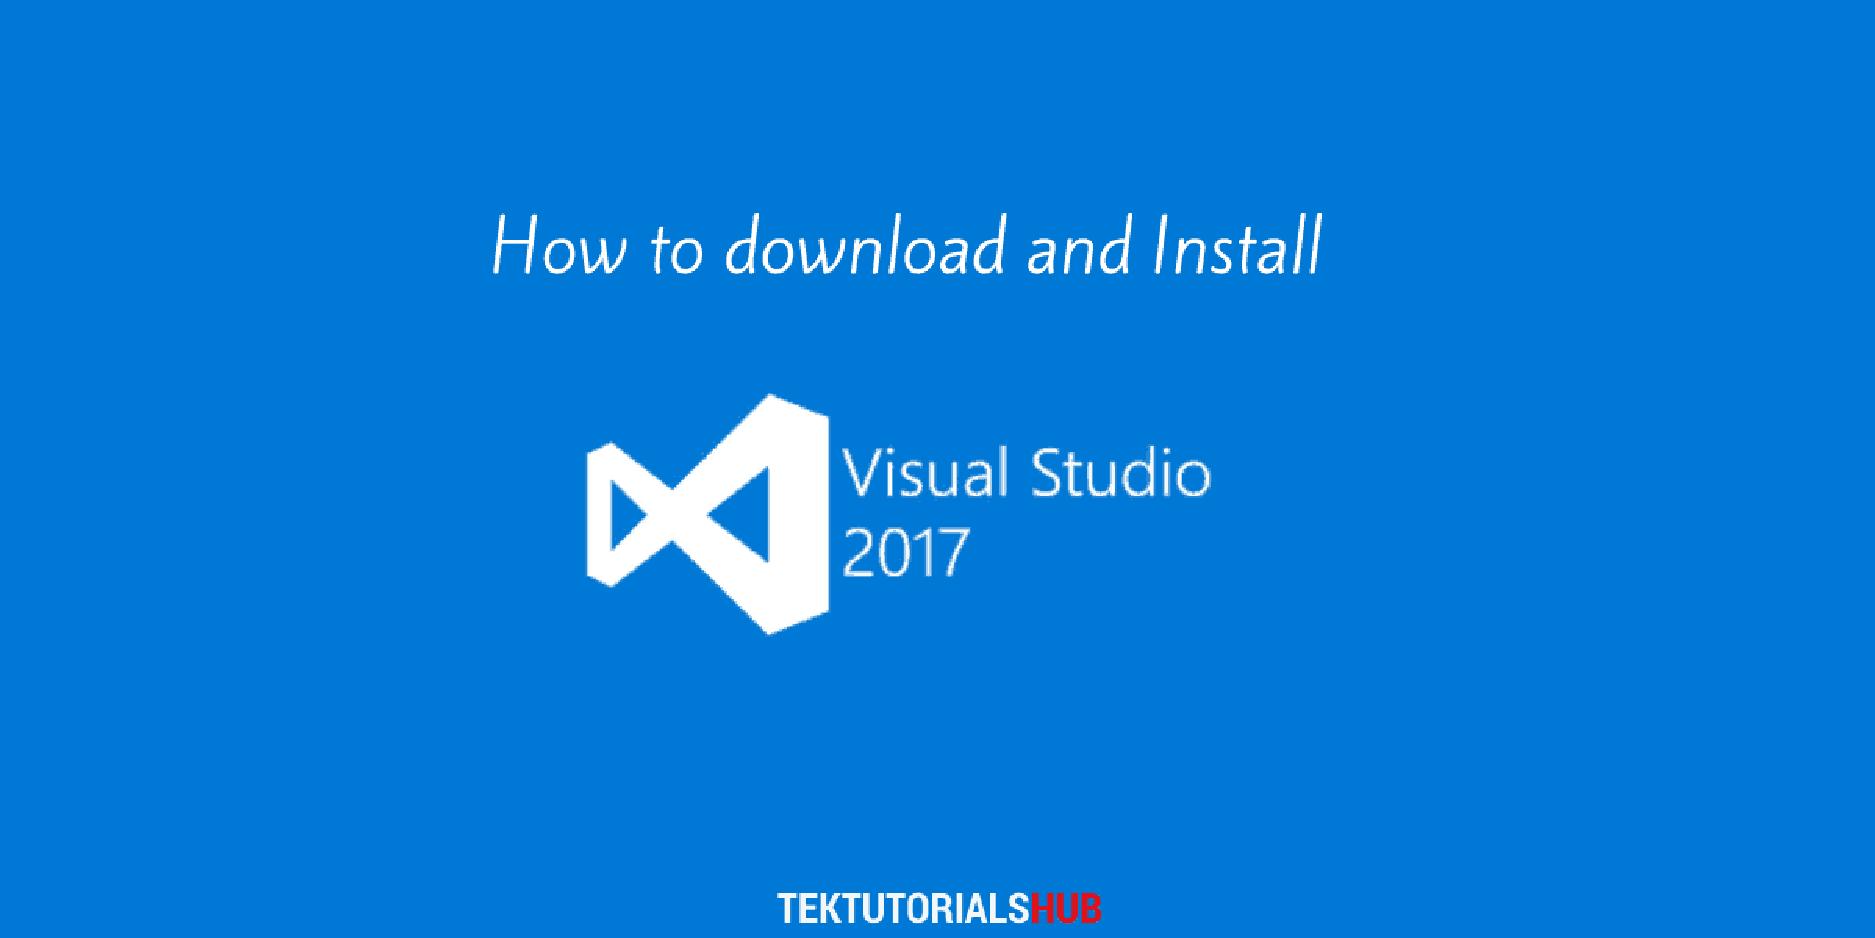 How to Download and Install Visual Studio 2017 - TekTutorialsHub